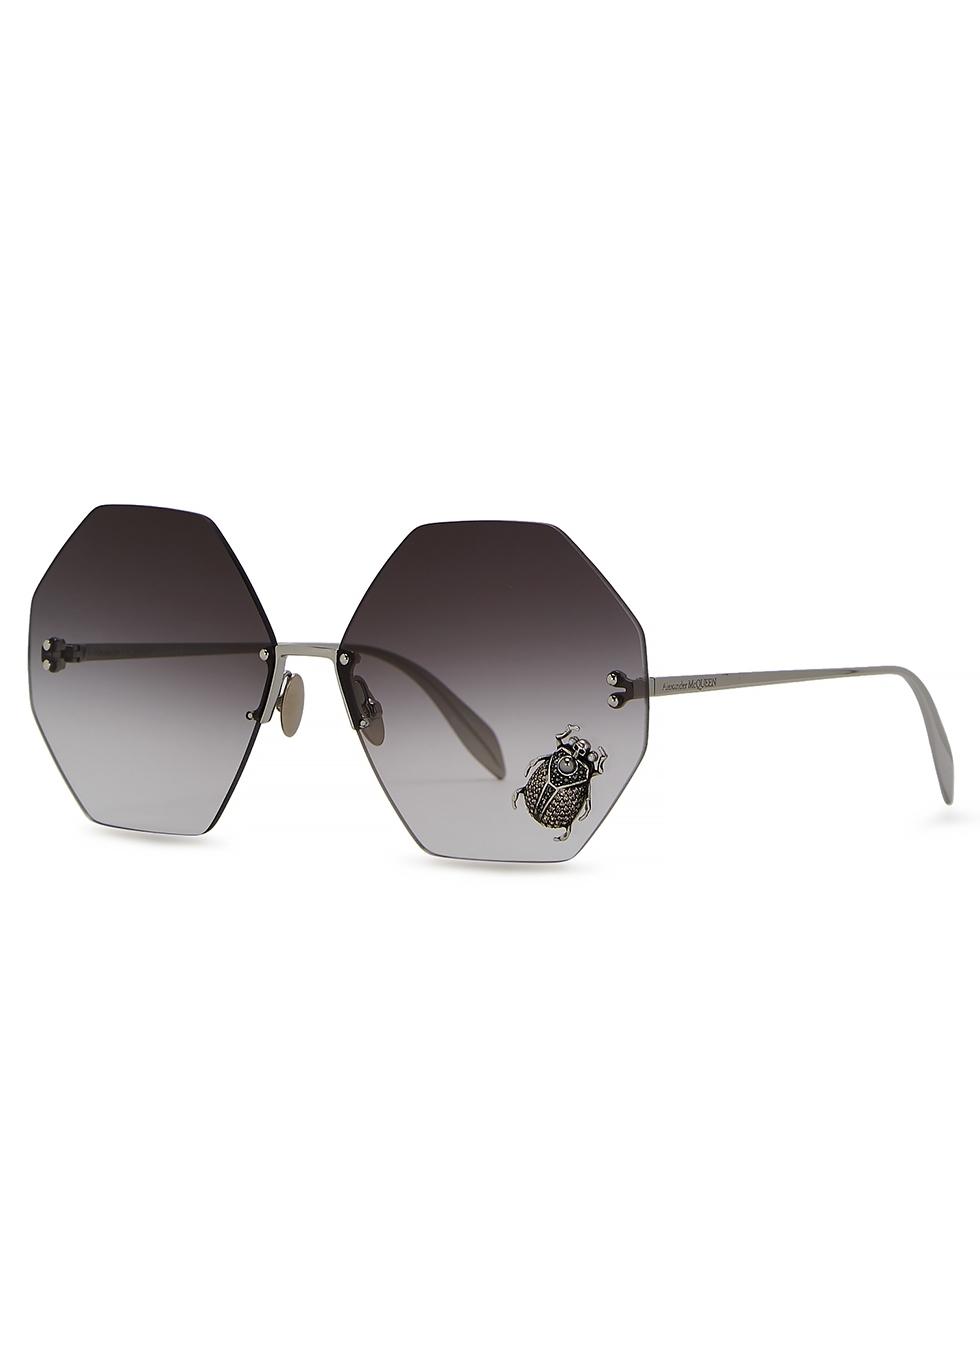 5f2081648e Women s Designer Sunglasses and Eyewear - Harvey Nichols